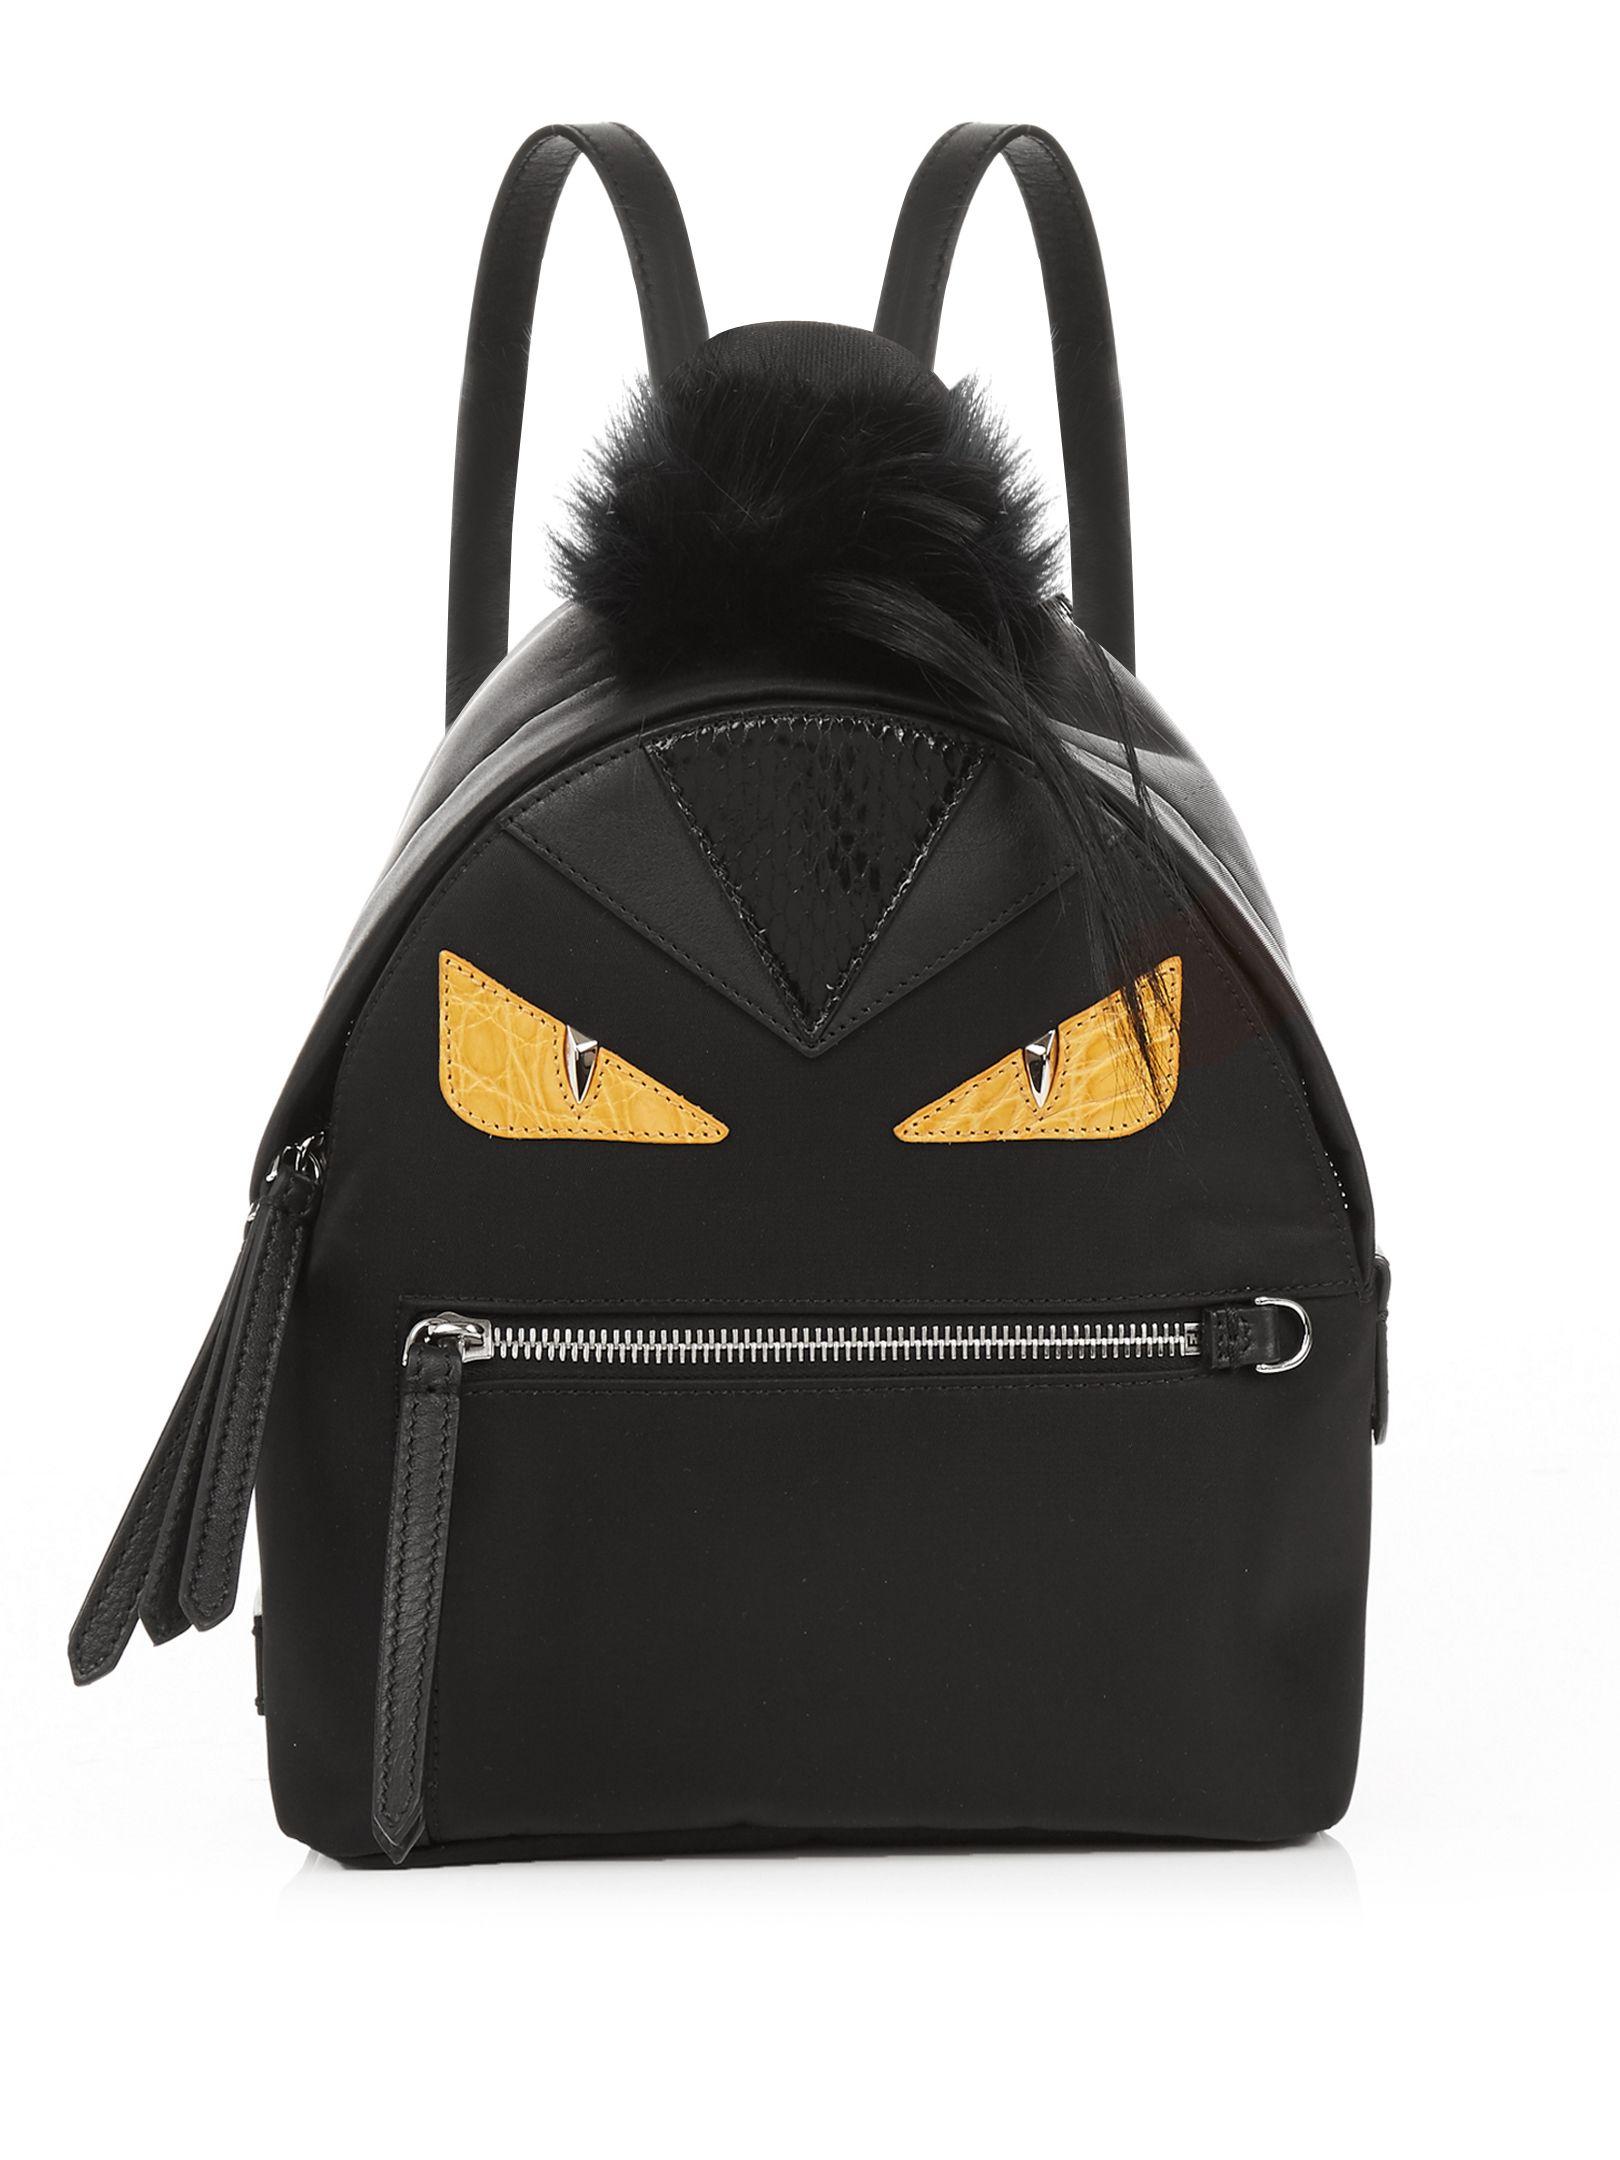 79920a8eb5 Click here to buy Fendi Bag Bugs mini nylon and fur backpack at  MATCHESFASHION.COM